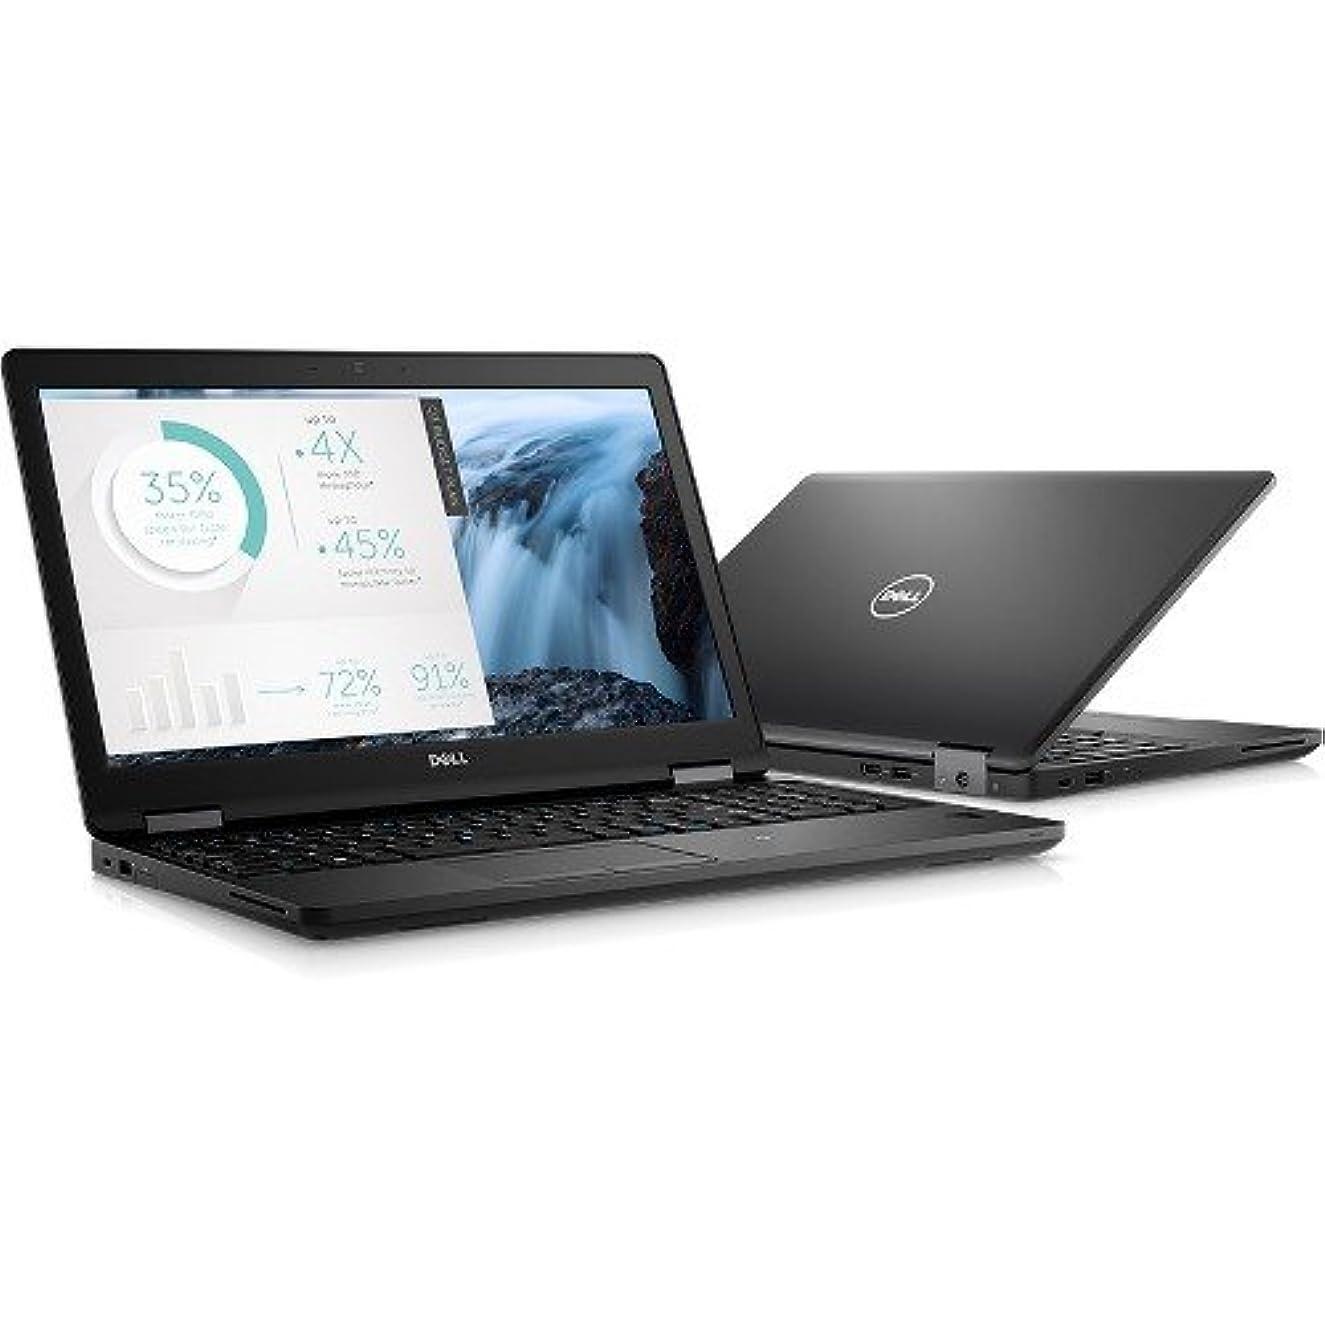 Dell VGY82 Latitude 5580 Laptop, 15.6